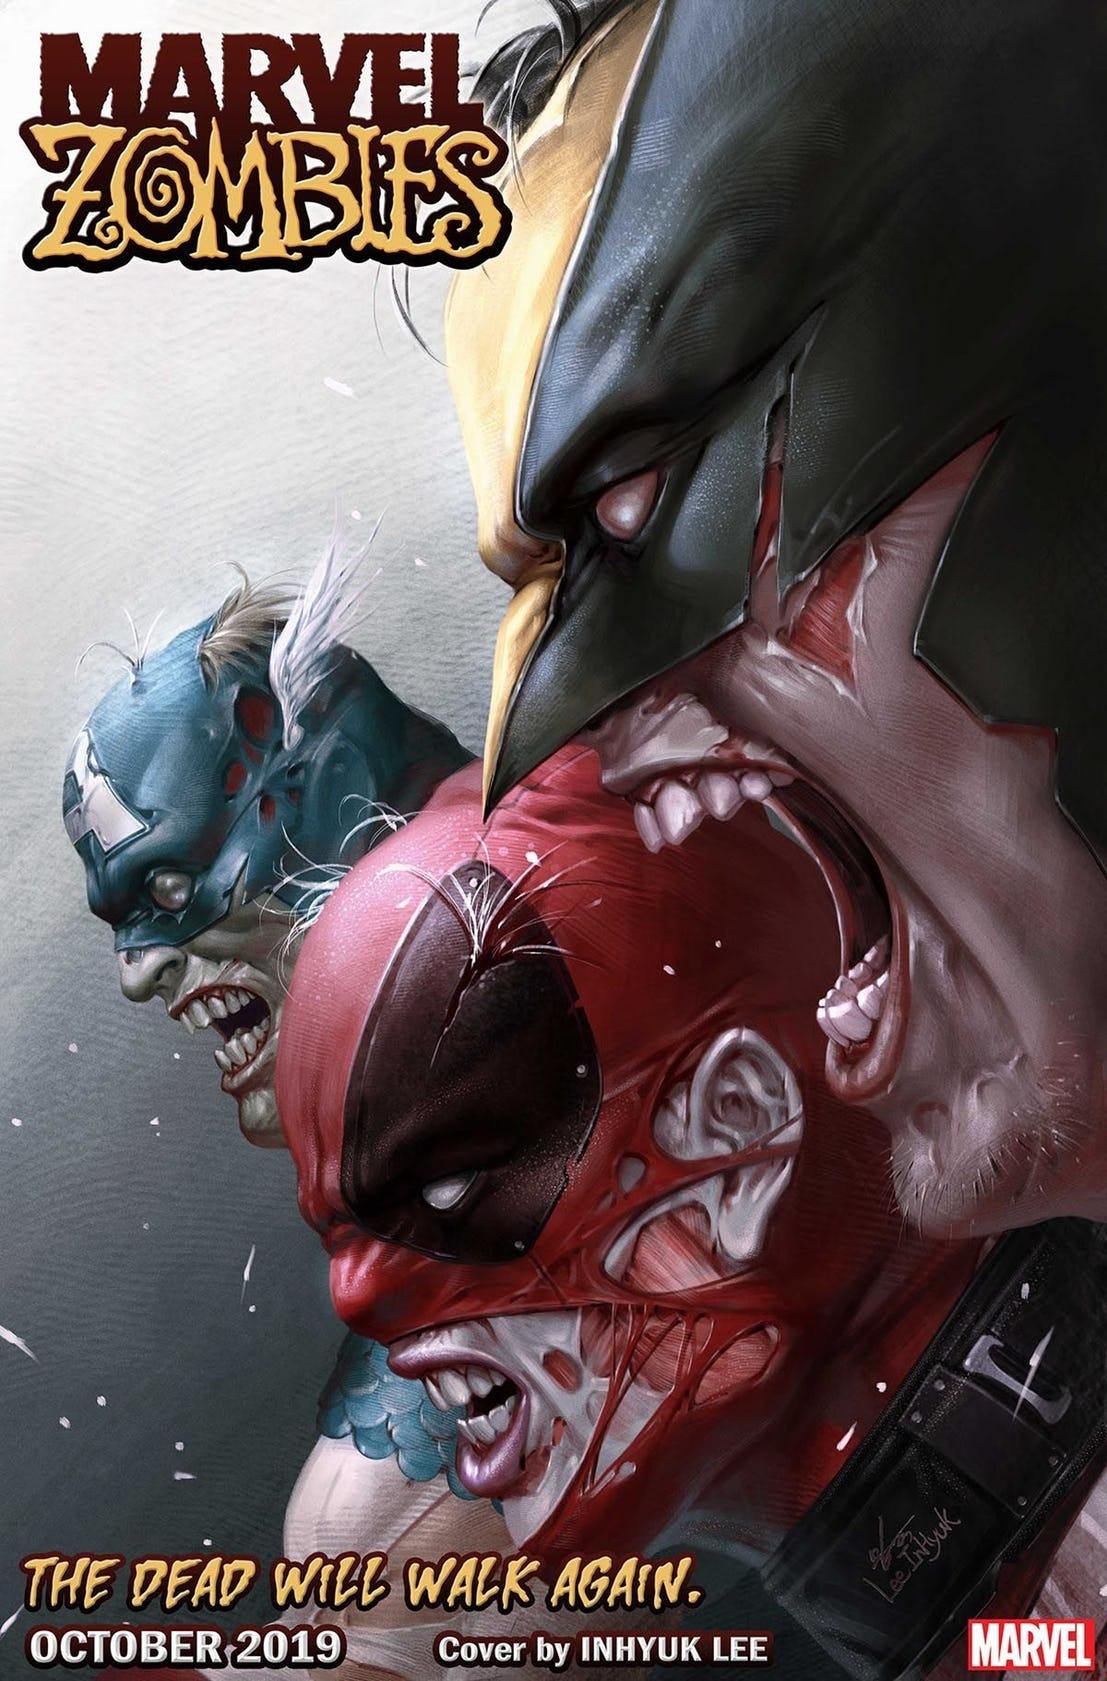 Marvel-Zombies-Teaser-Image.jpg